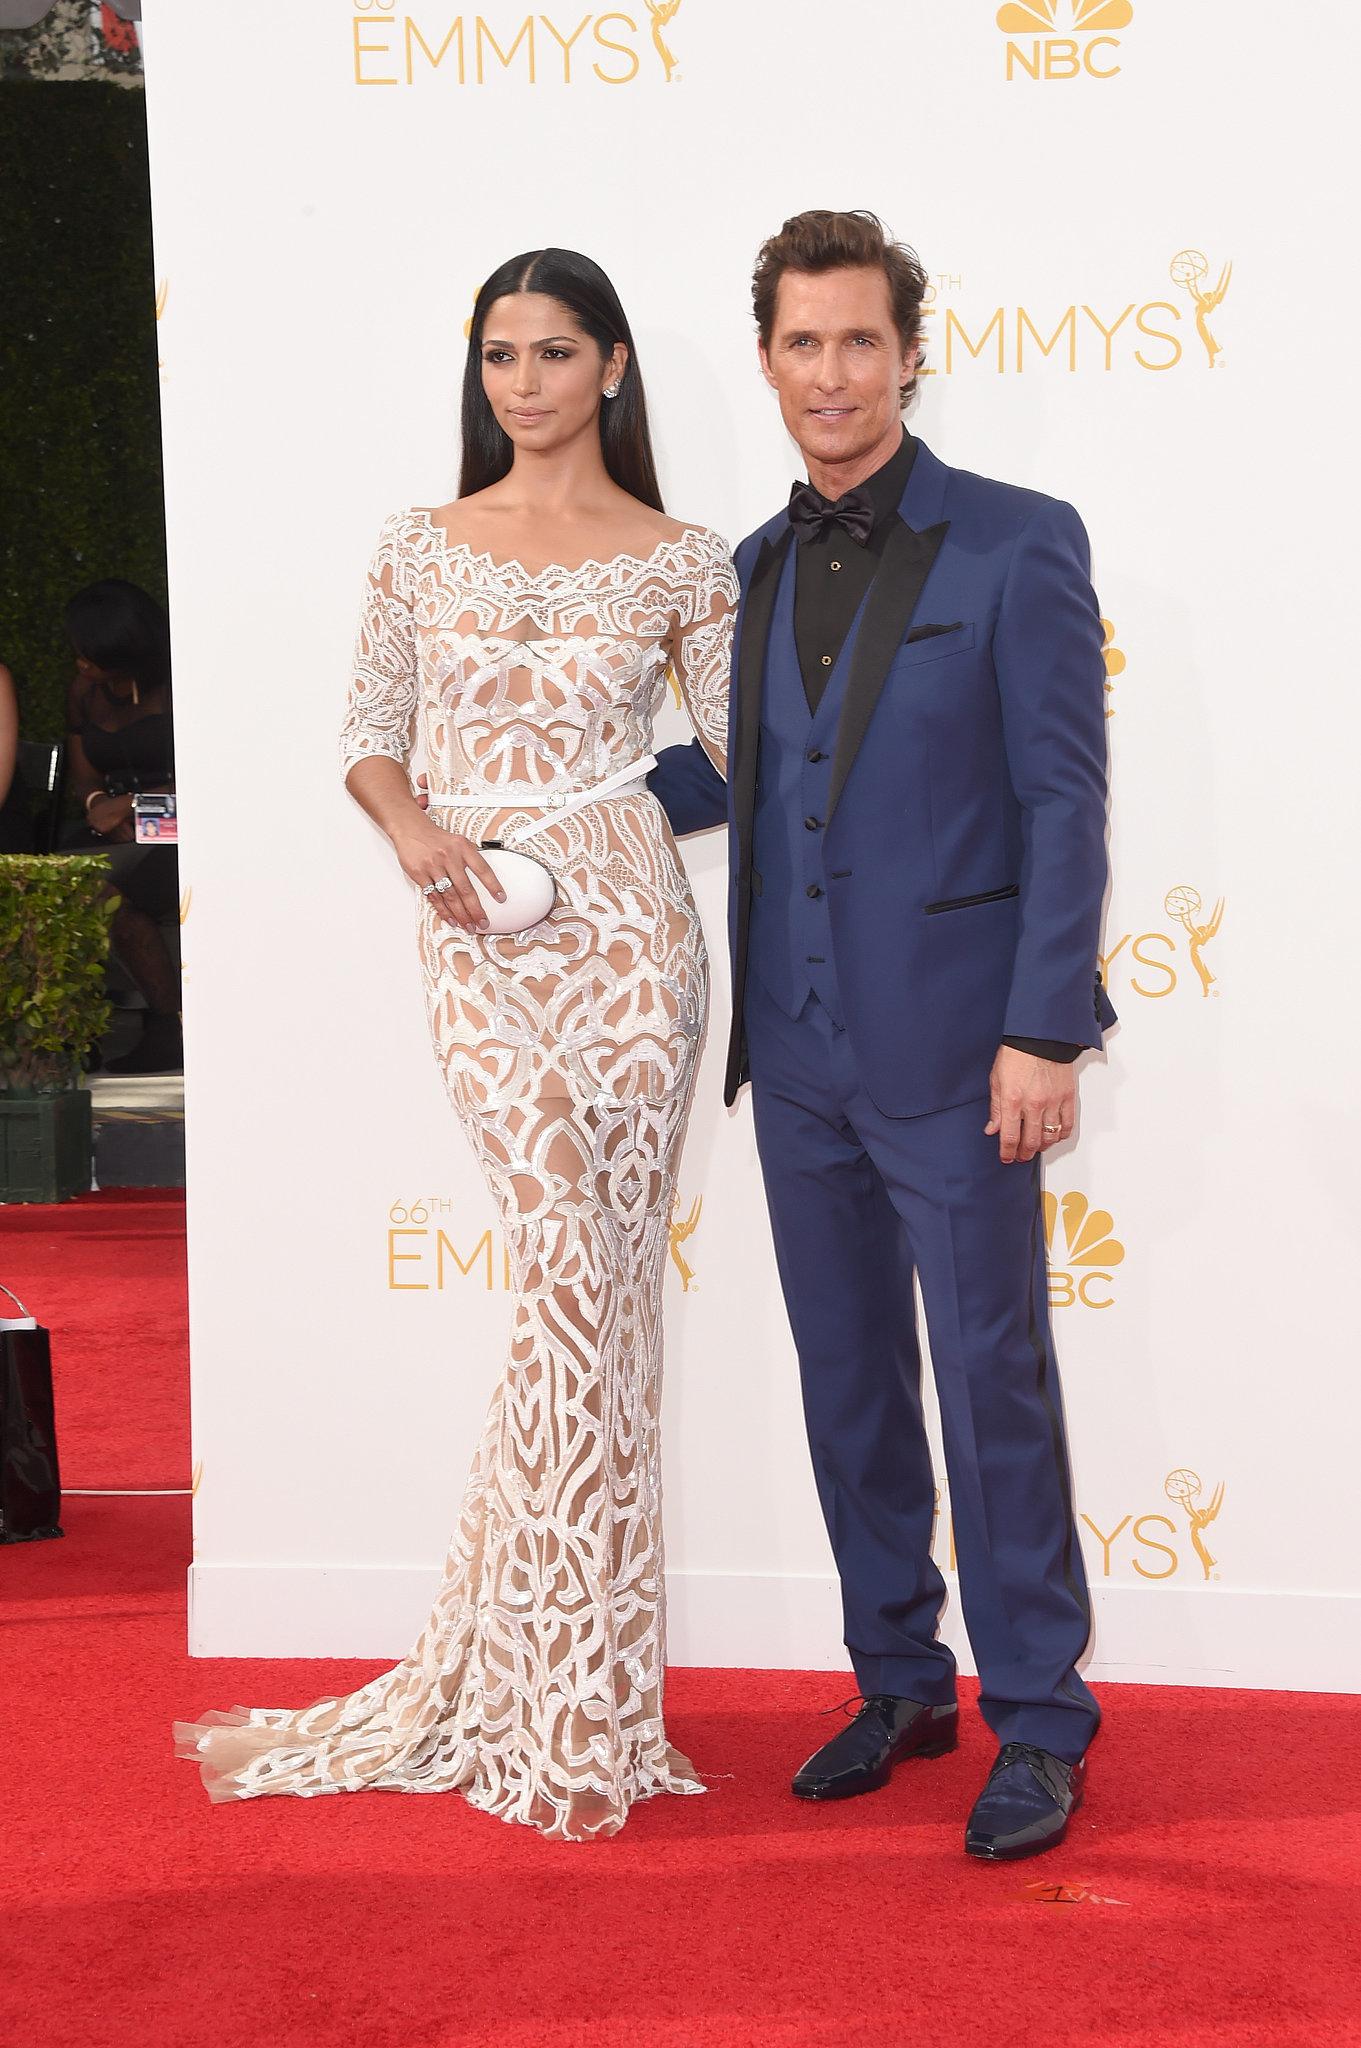 Matthew McConaughey and Camila Alves at the 2014 Emmy Awards